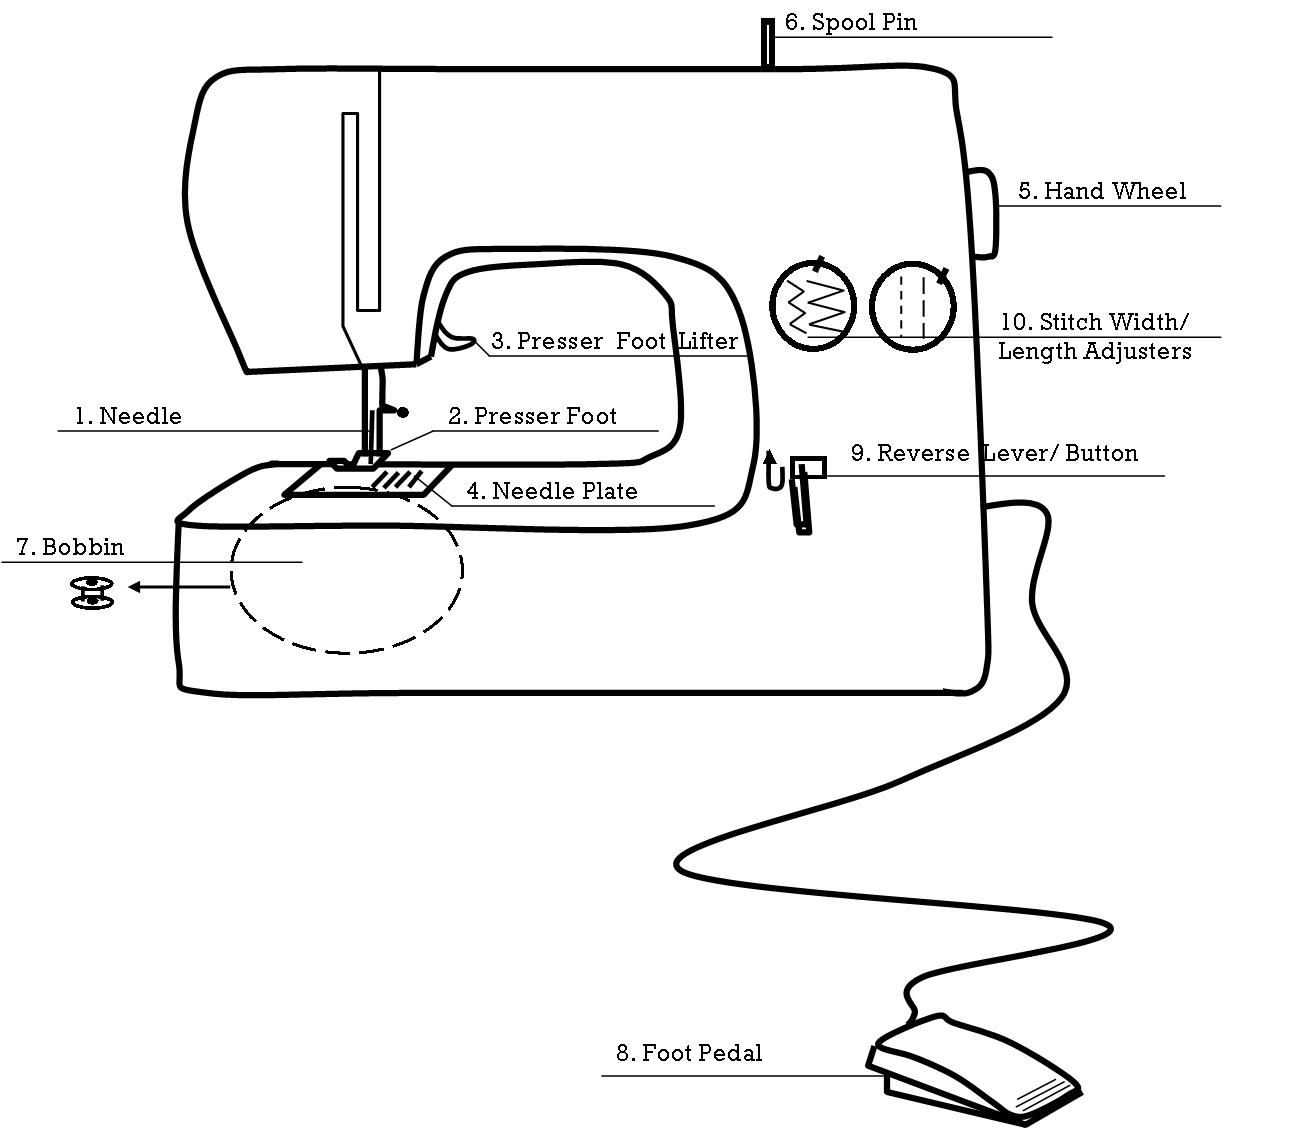 Sewingmachine Yellow Spool